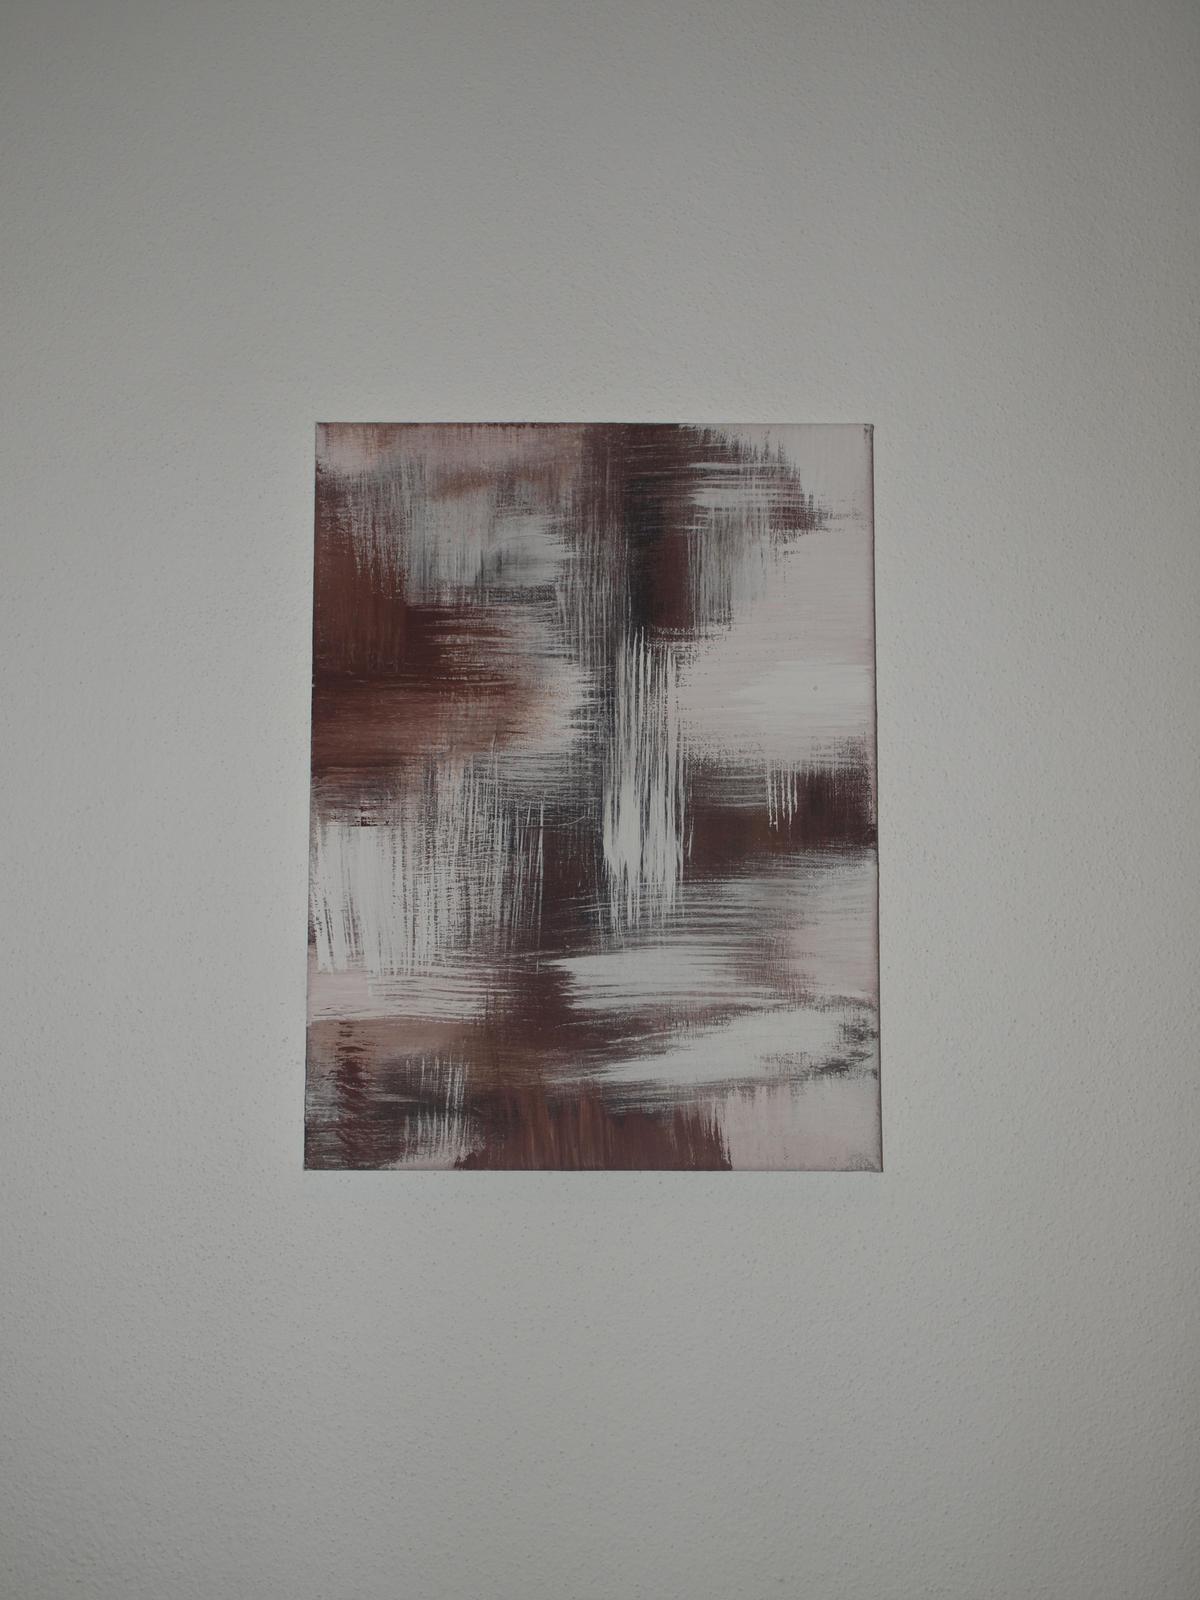 Dekorace -hledám, tvořím - Obrázek č. 8